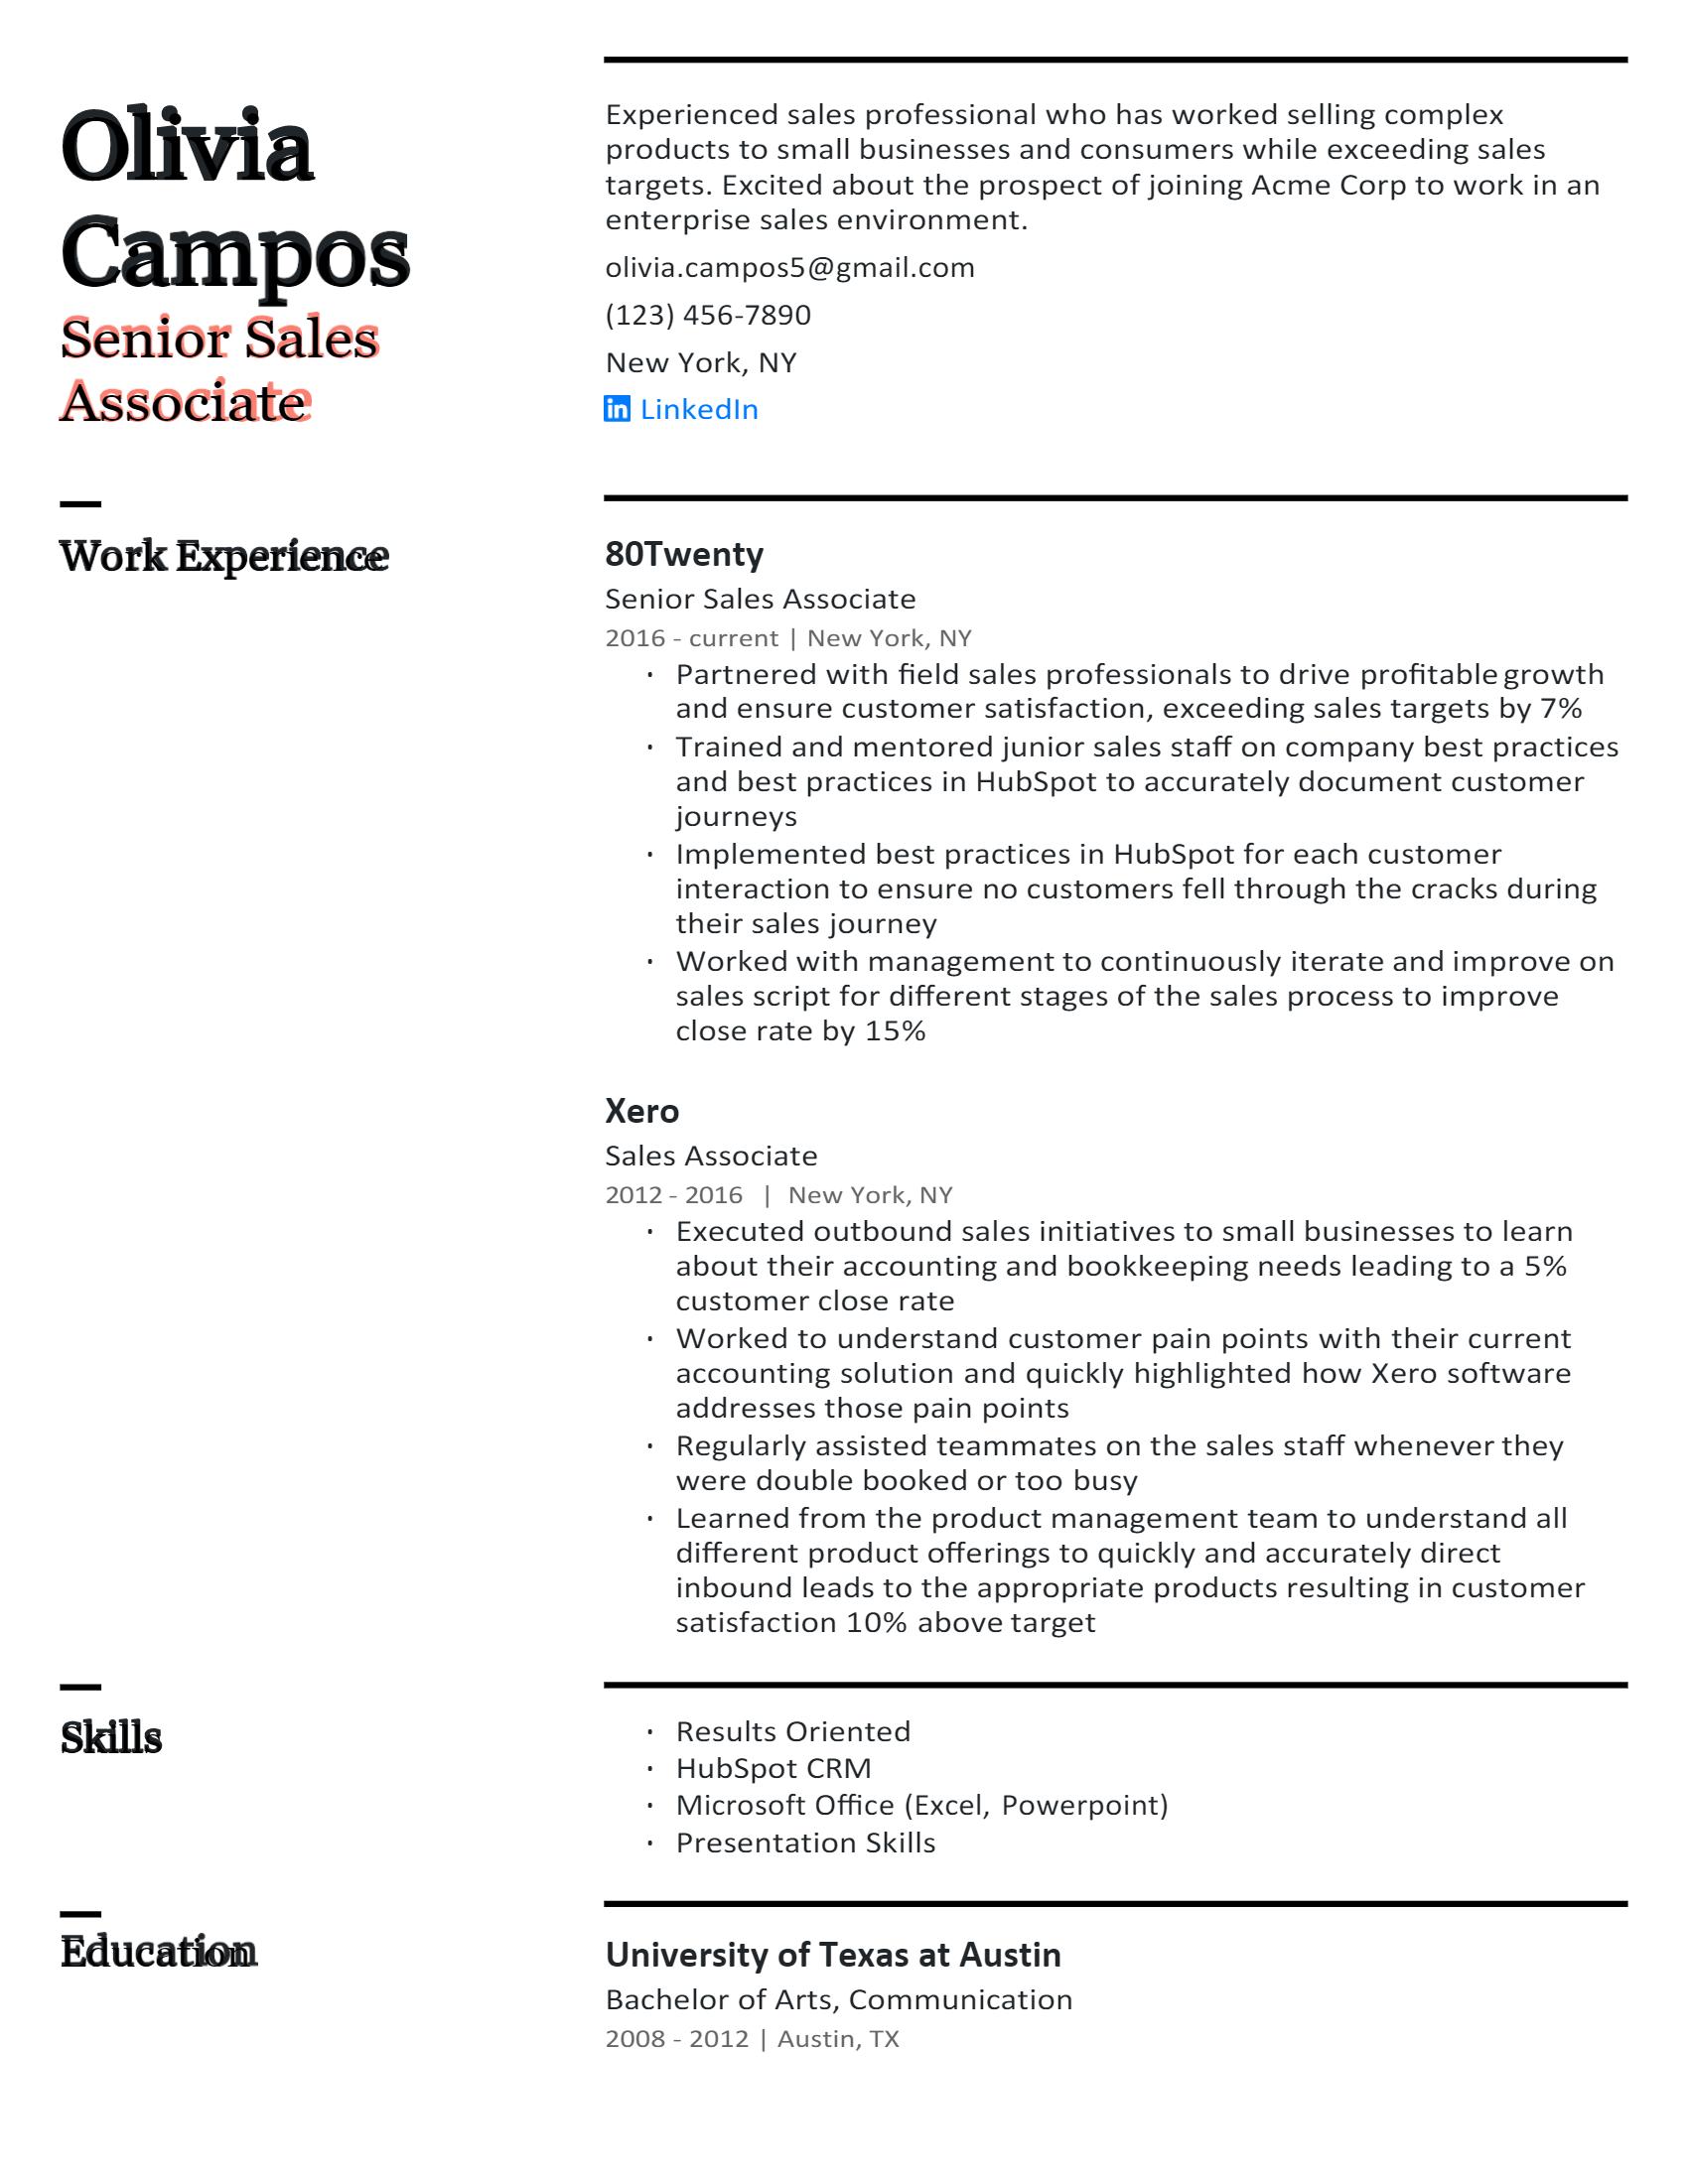 Senior Sales Associate Resume